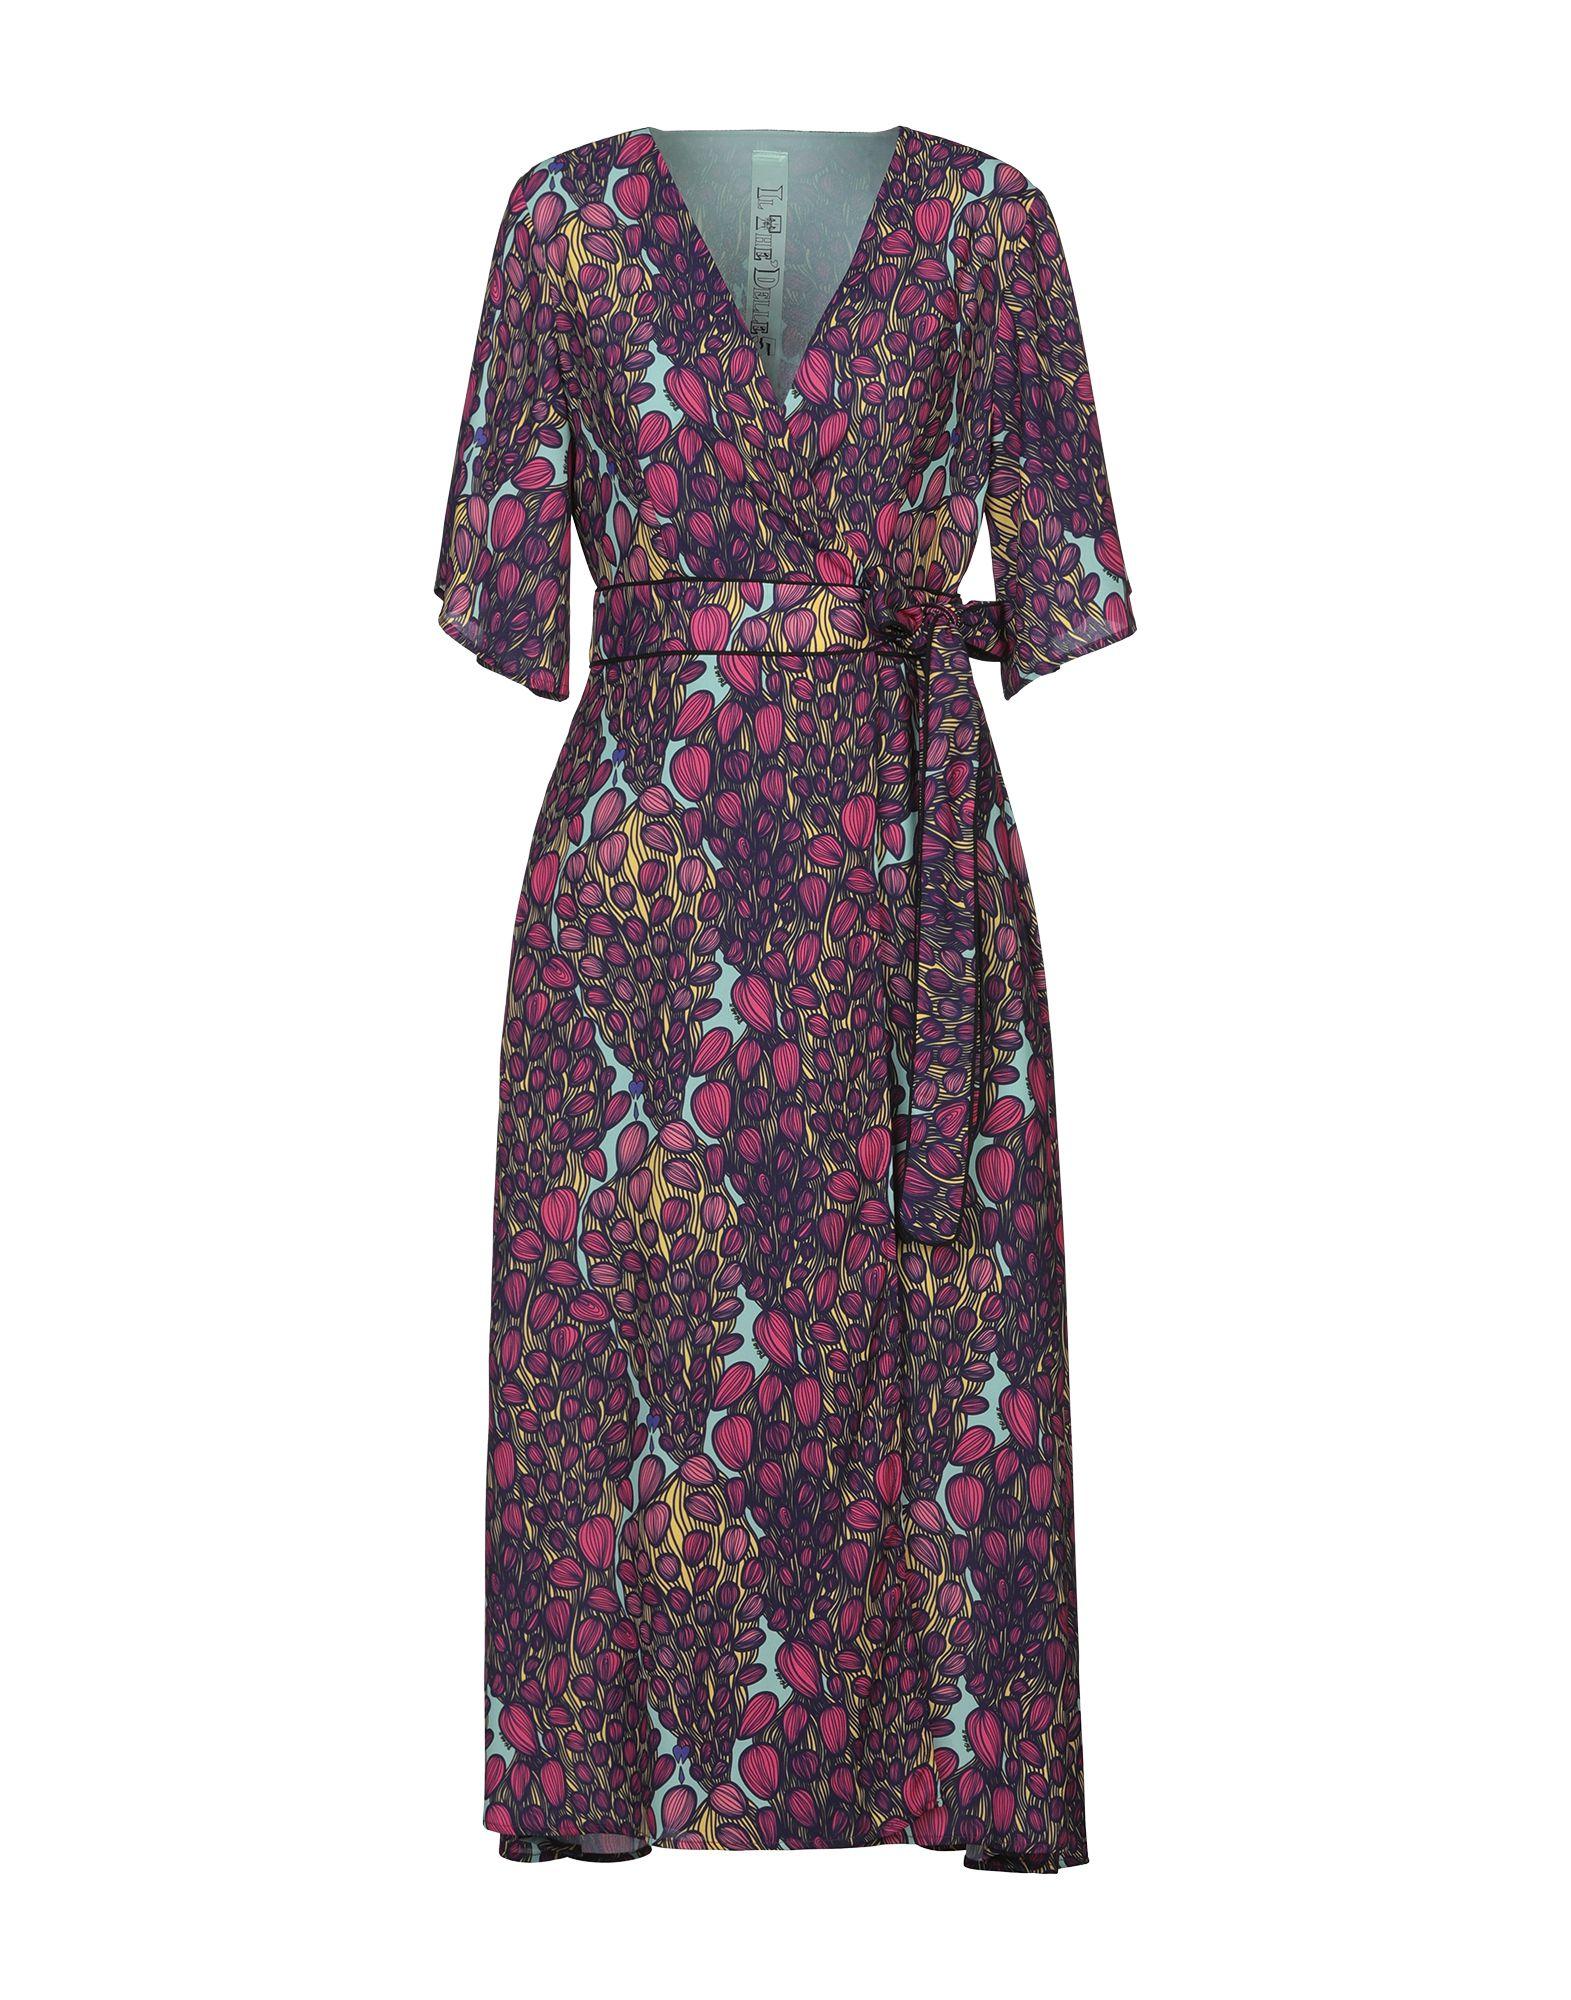 IL THE' DELLE 5 Платье длиной 3/4